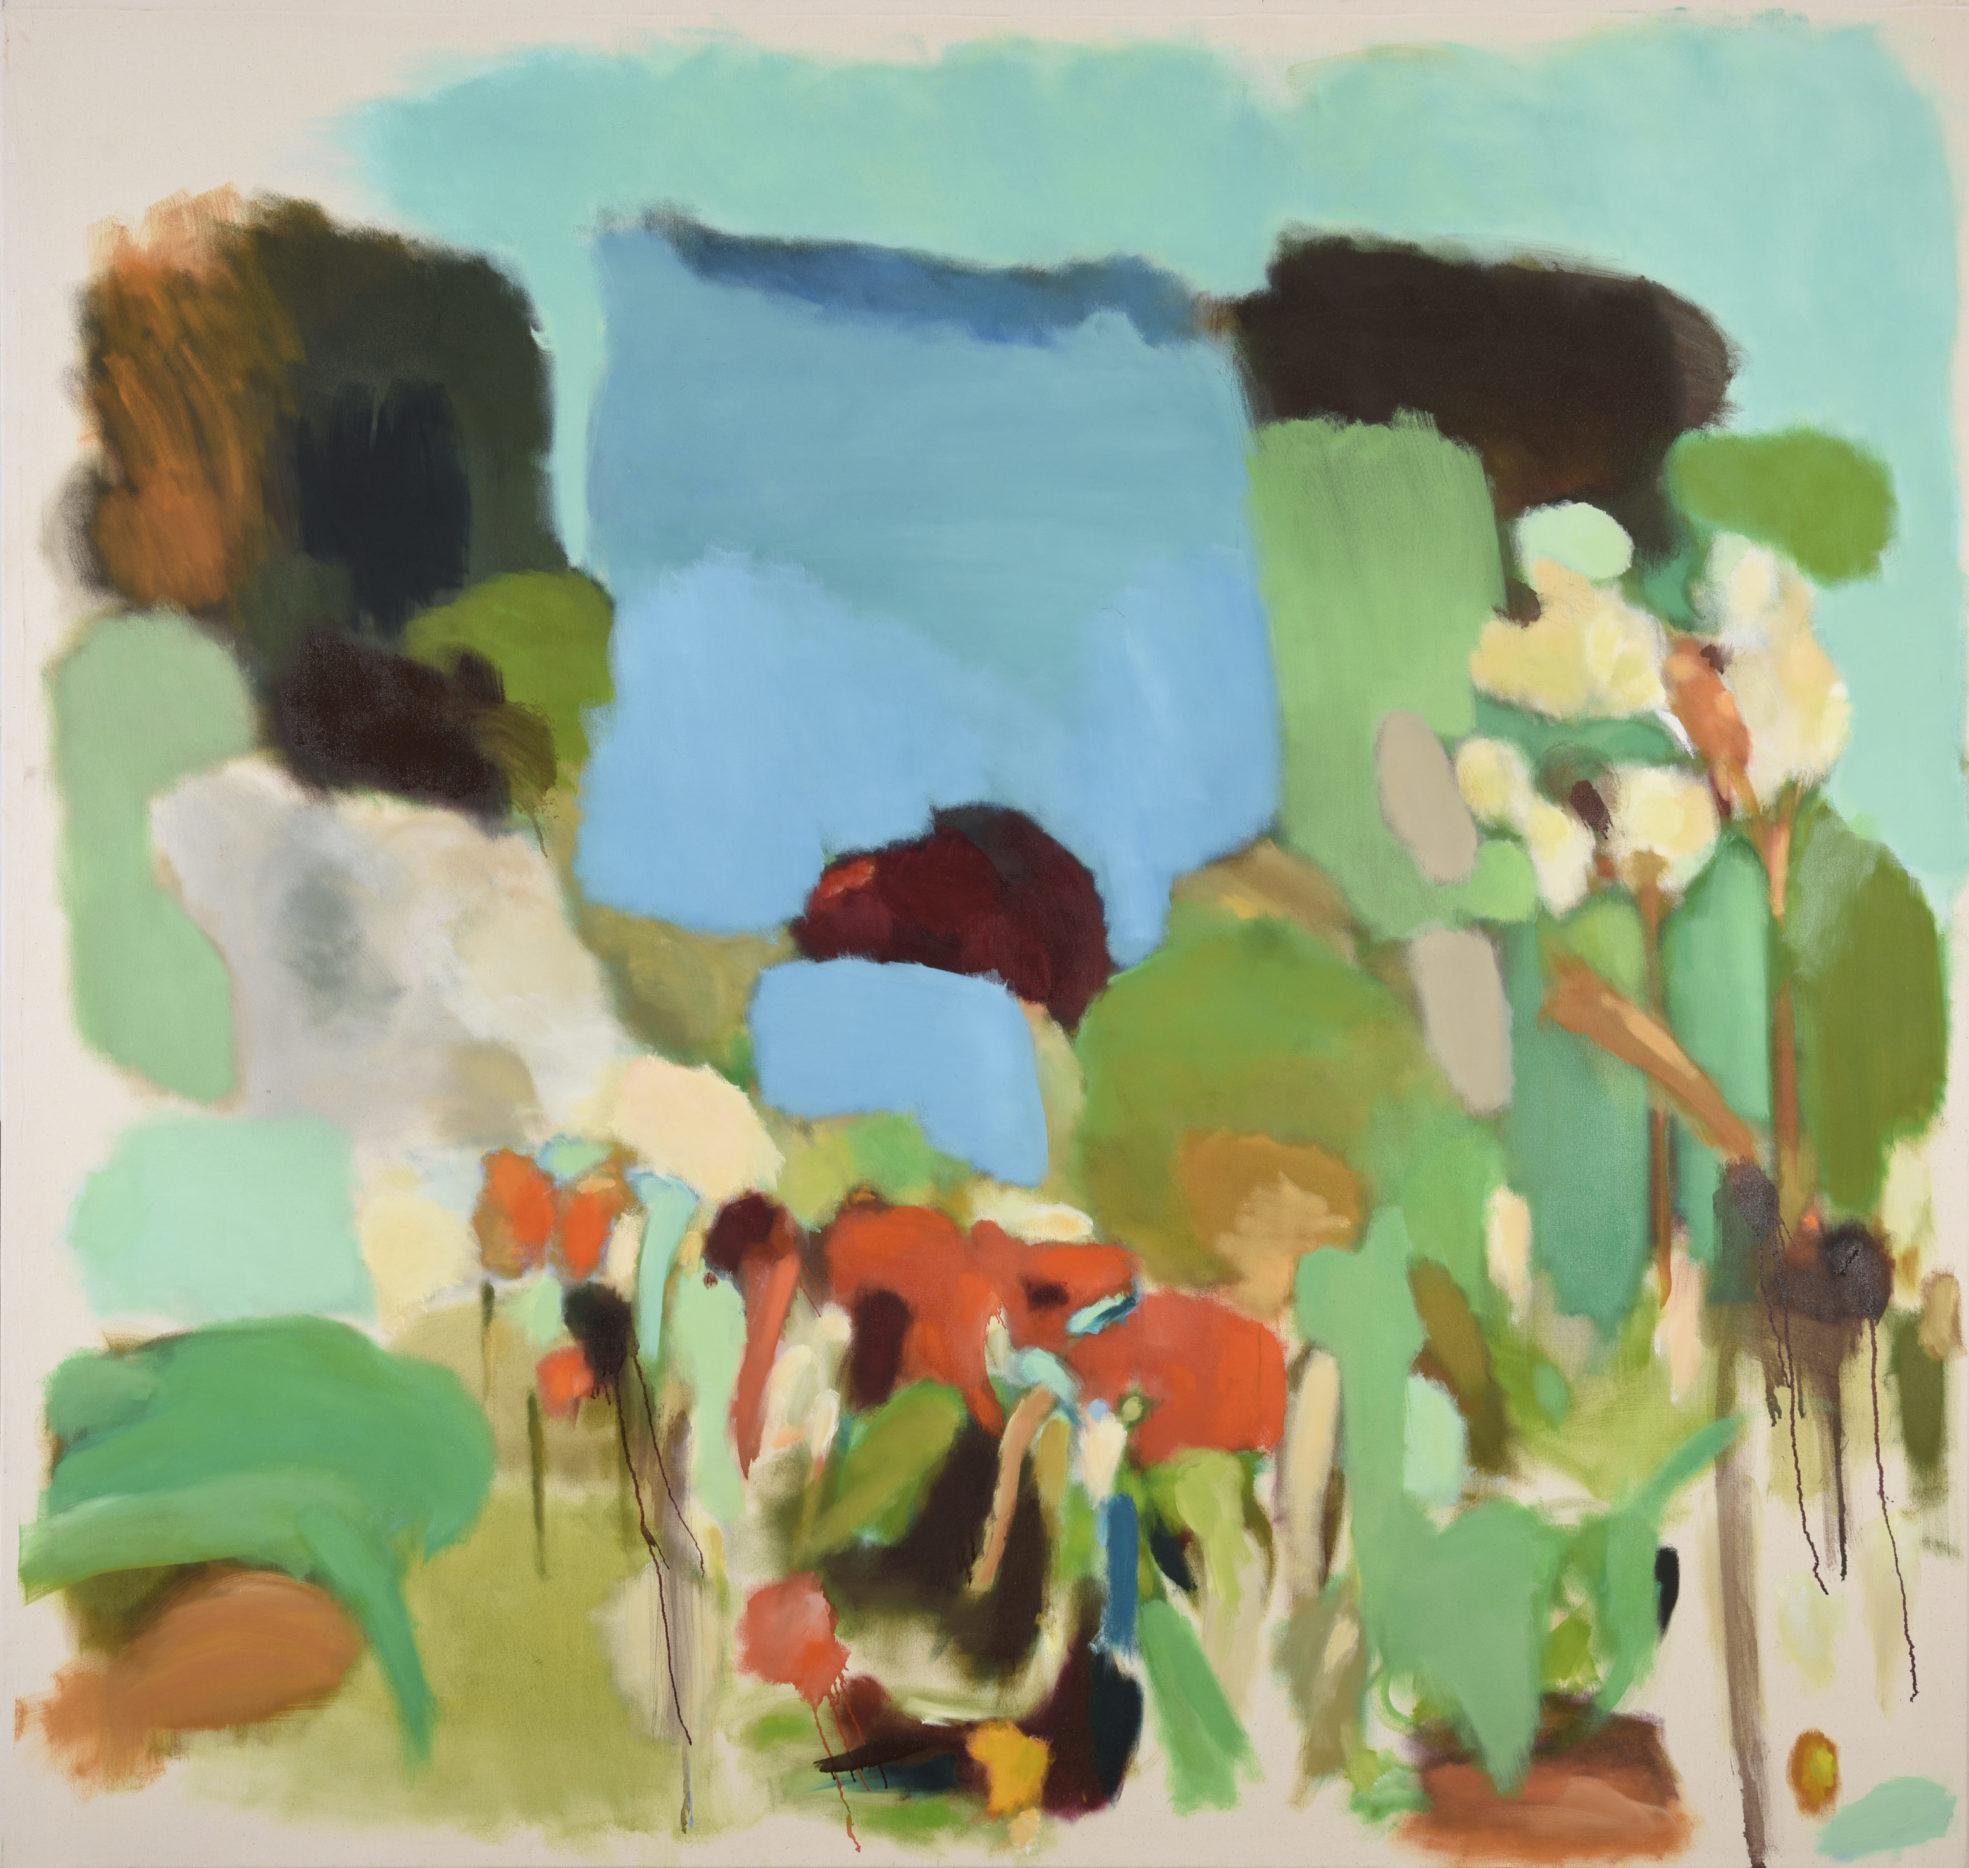 juliette sturlese painting triptych oil on canvas jungle peak district